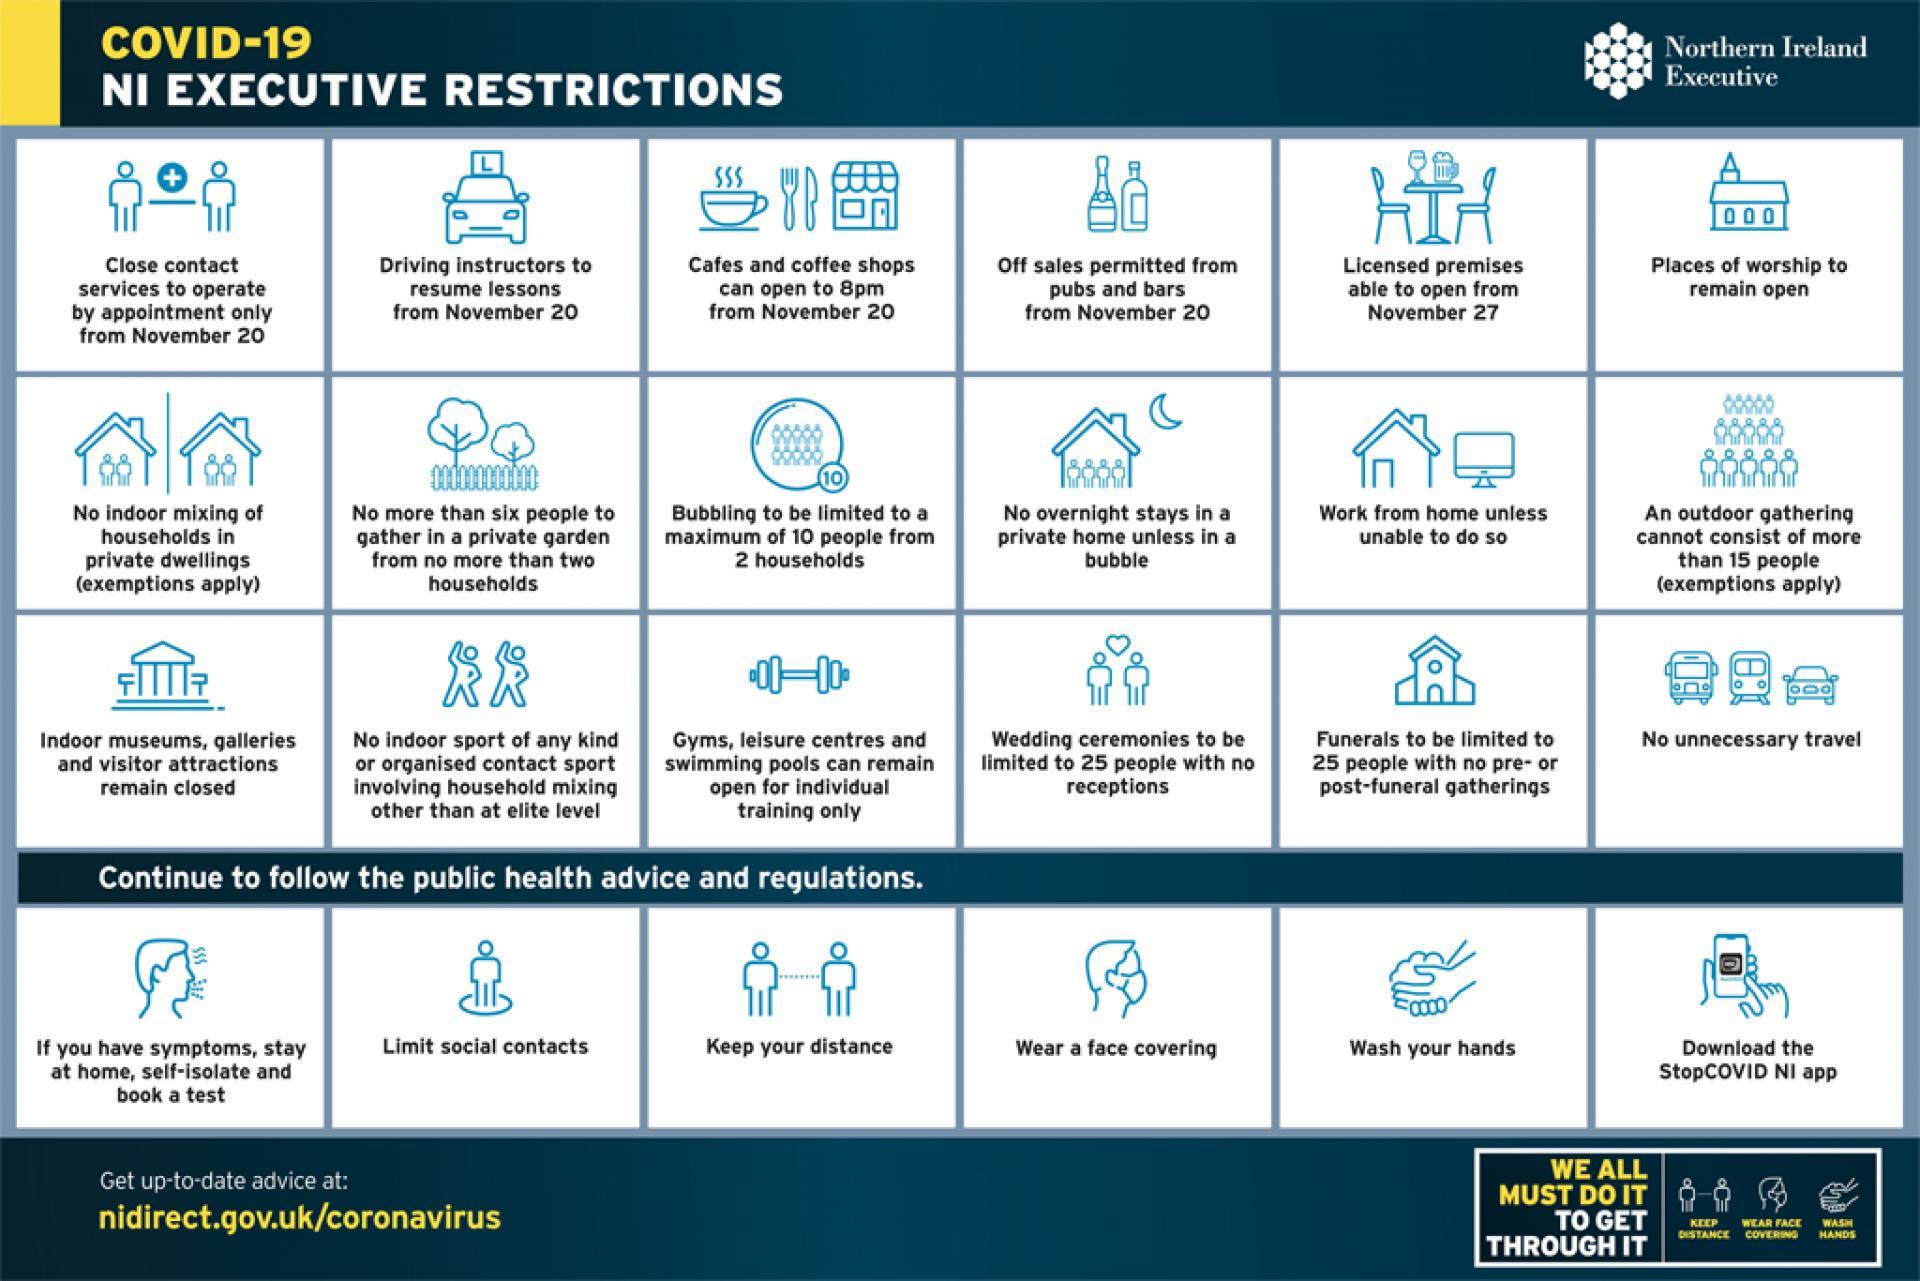 NI executive restrictions